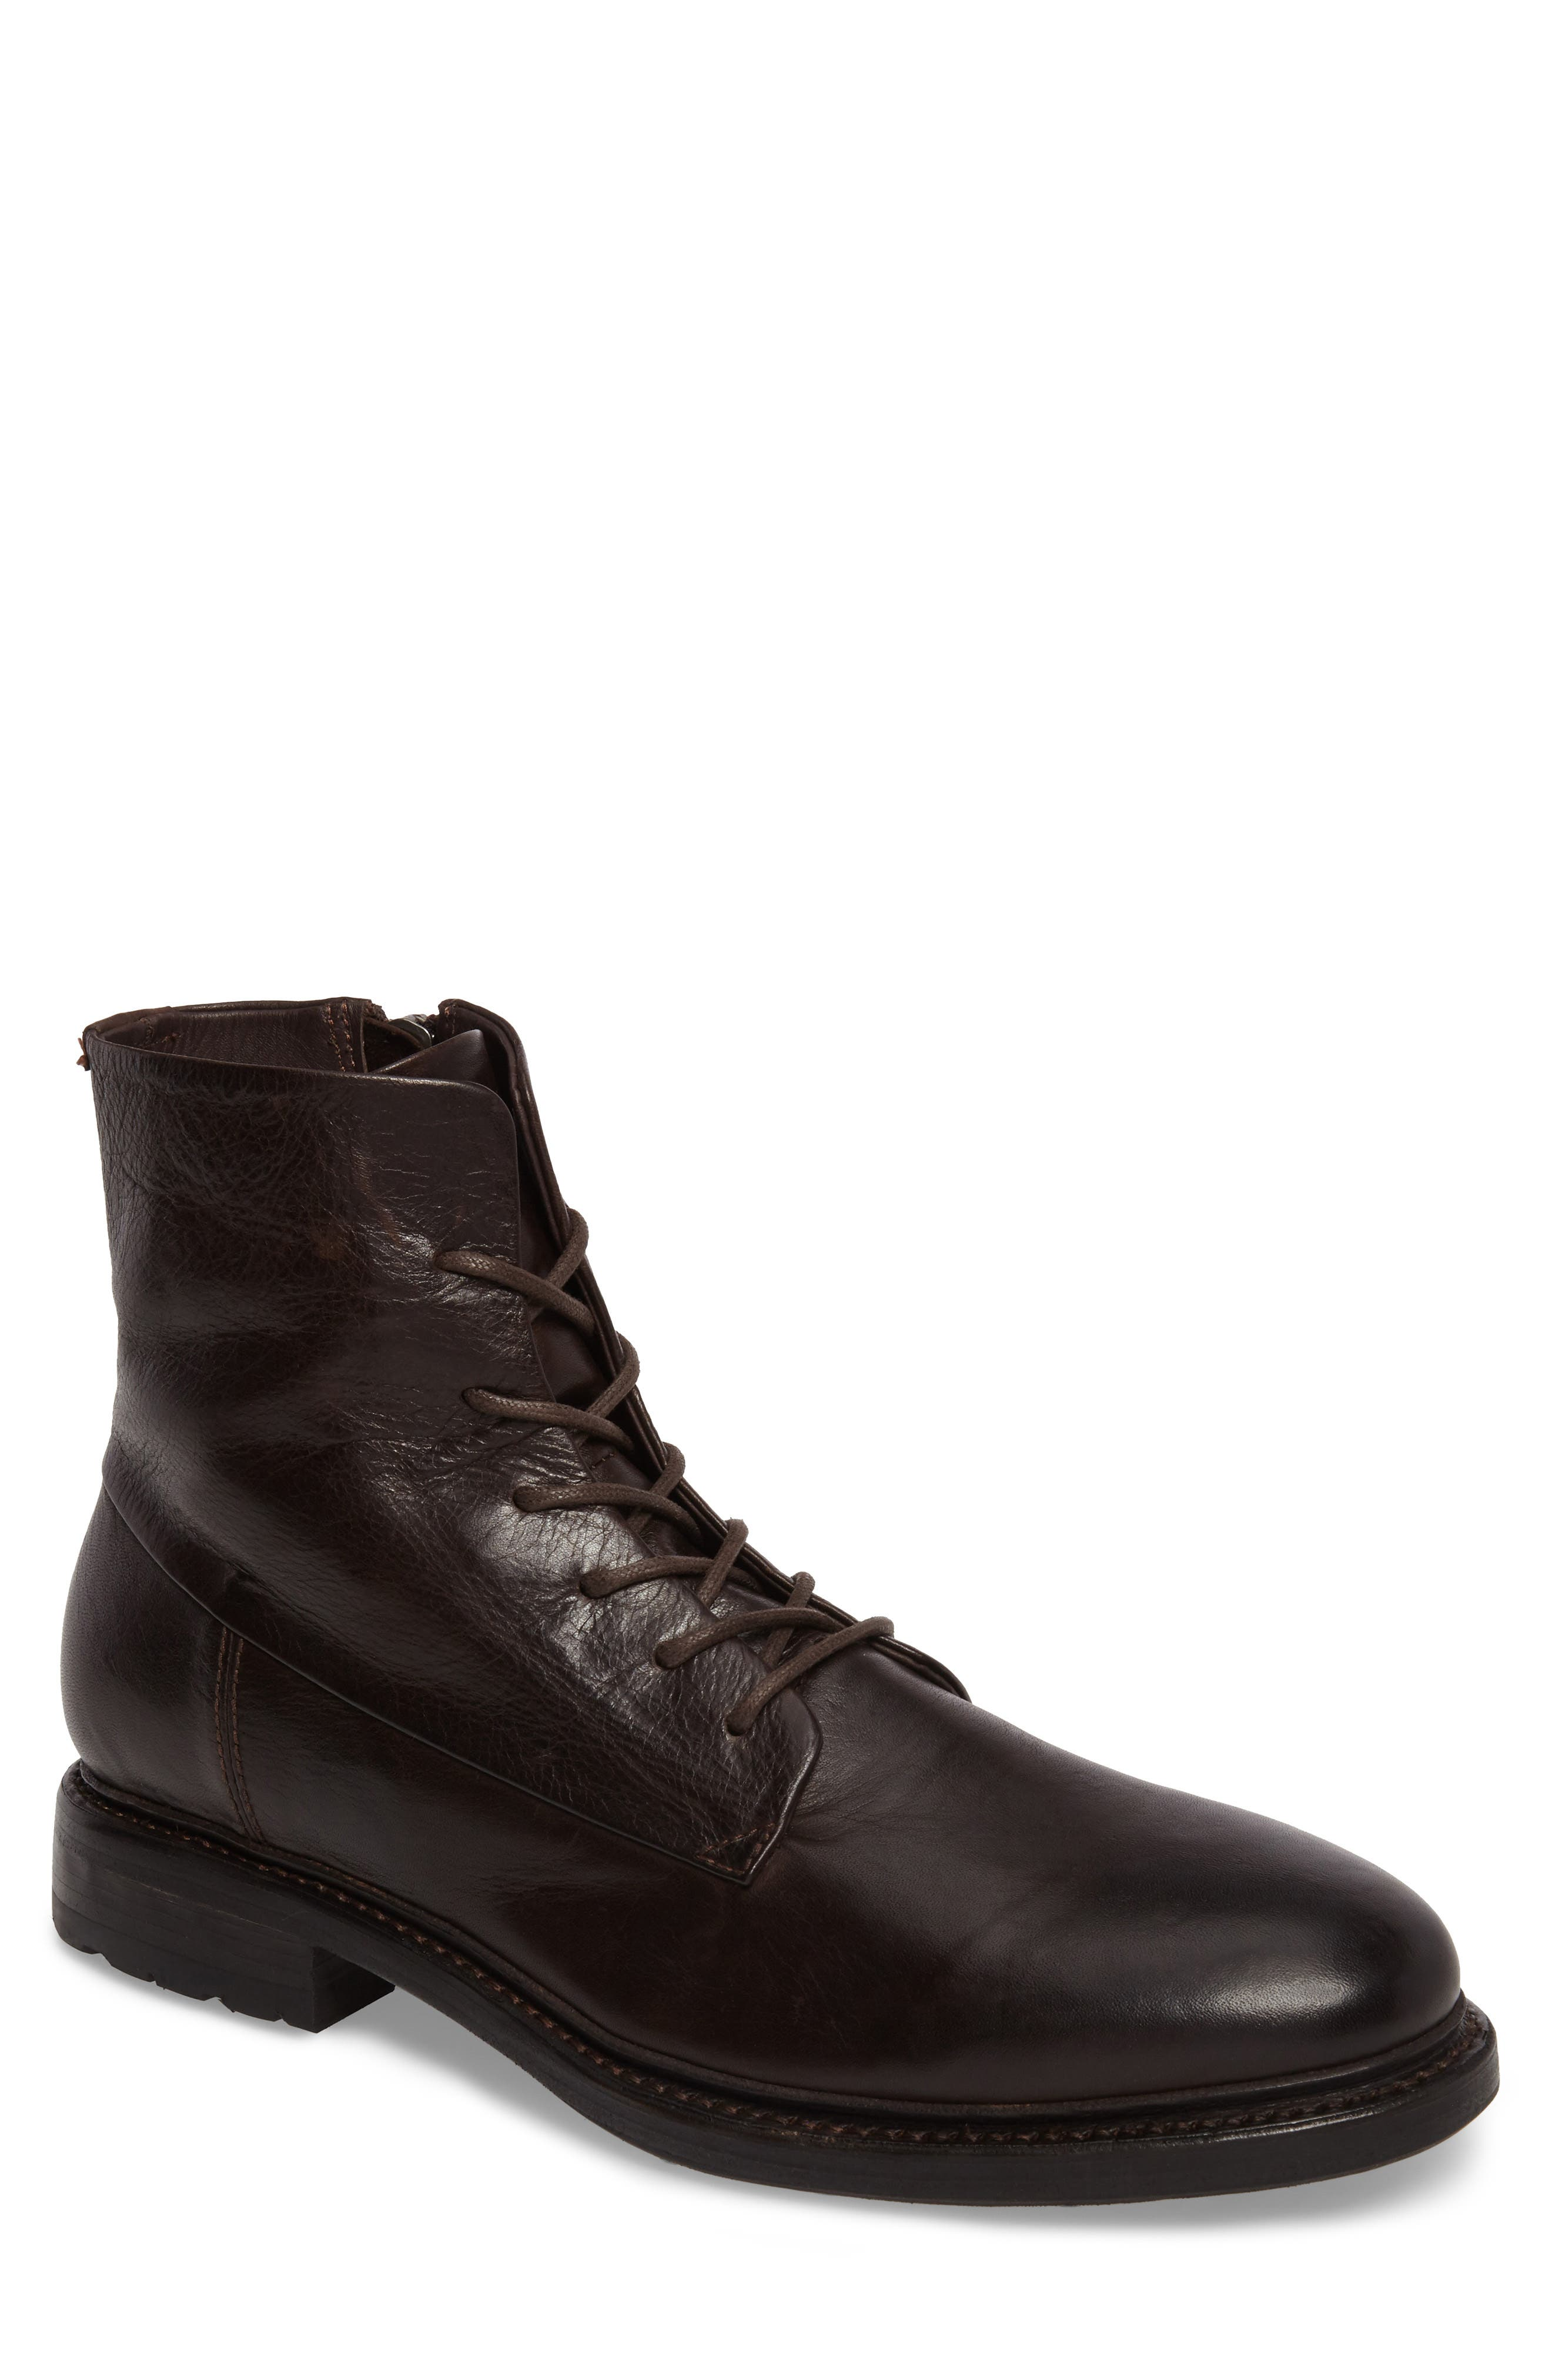 Alternate Image 1 Selected - Blackstone MM 08 Plain Toe Boot (Men)